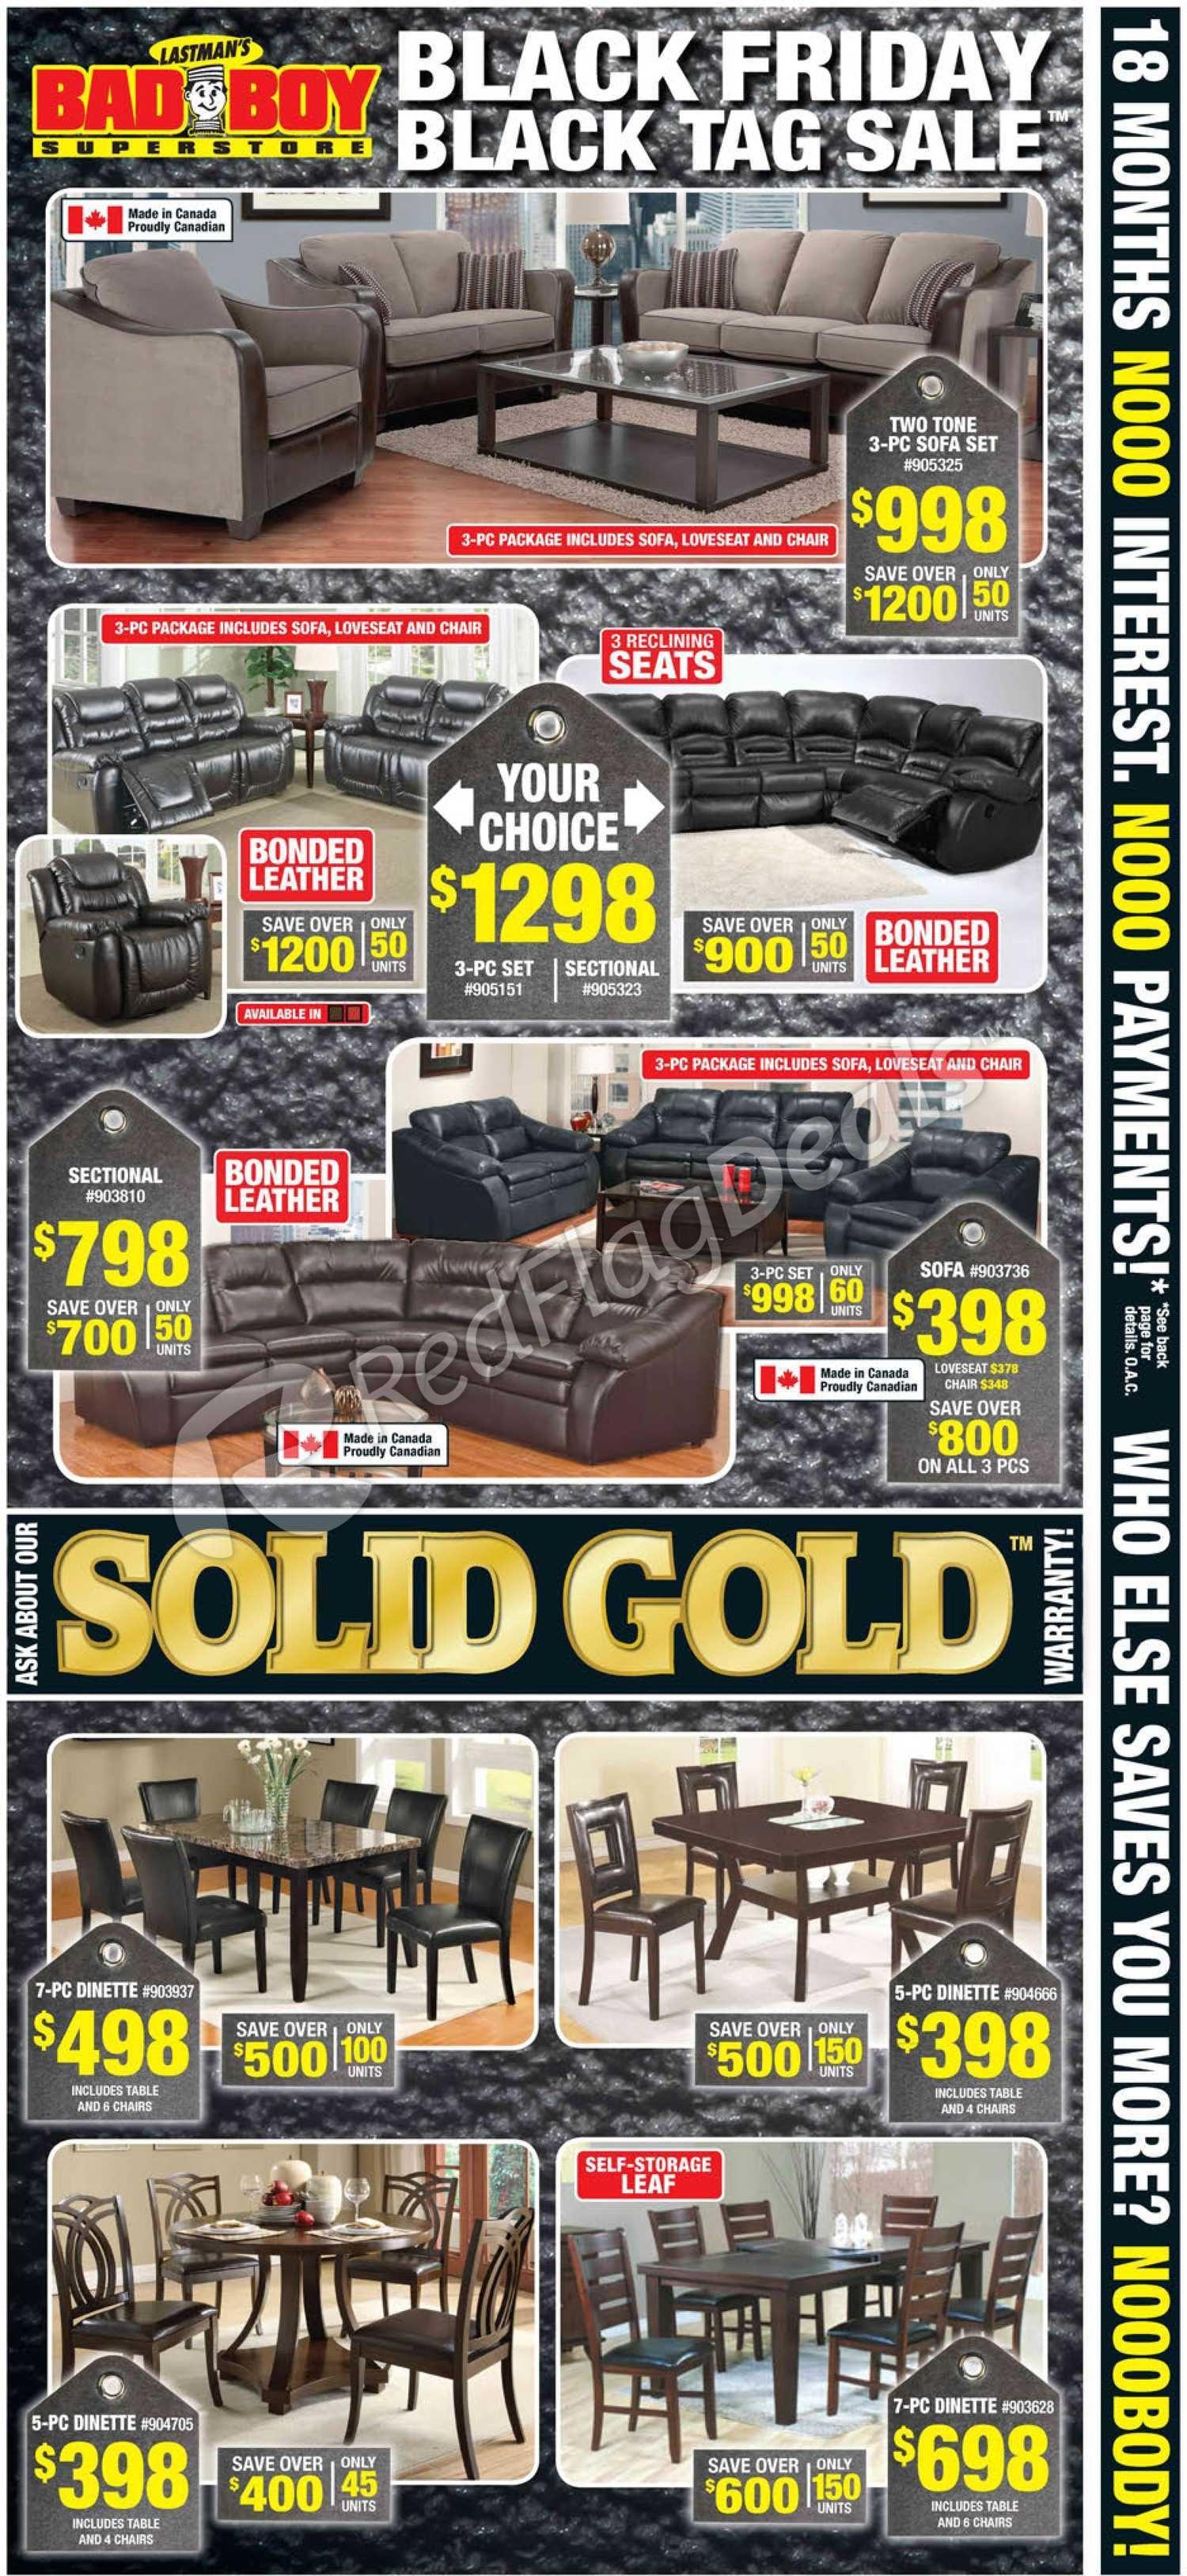 black friday sofa deals toronto affordable modern sectional sofas bad boy furniture weekly flyer tag